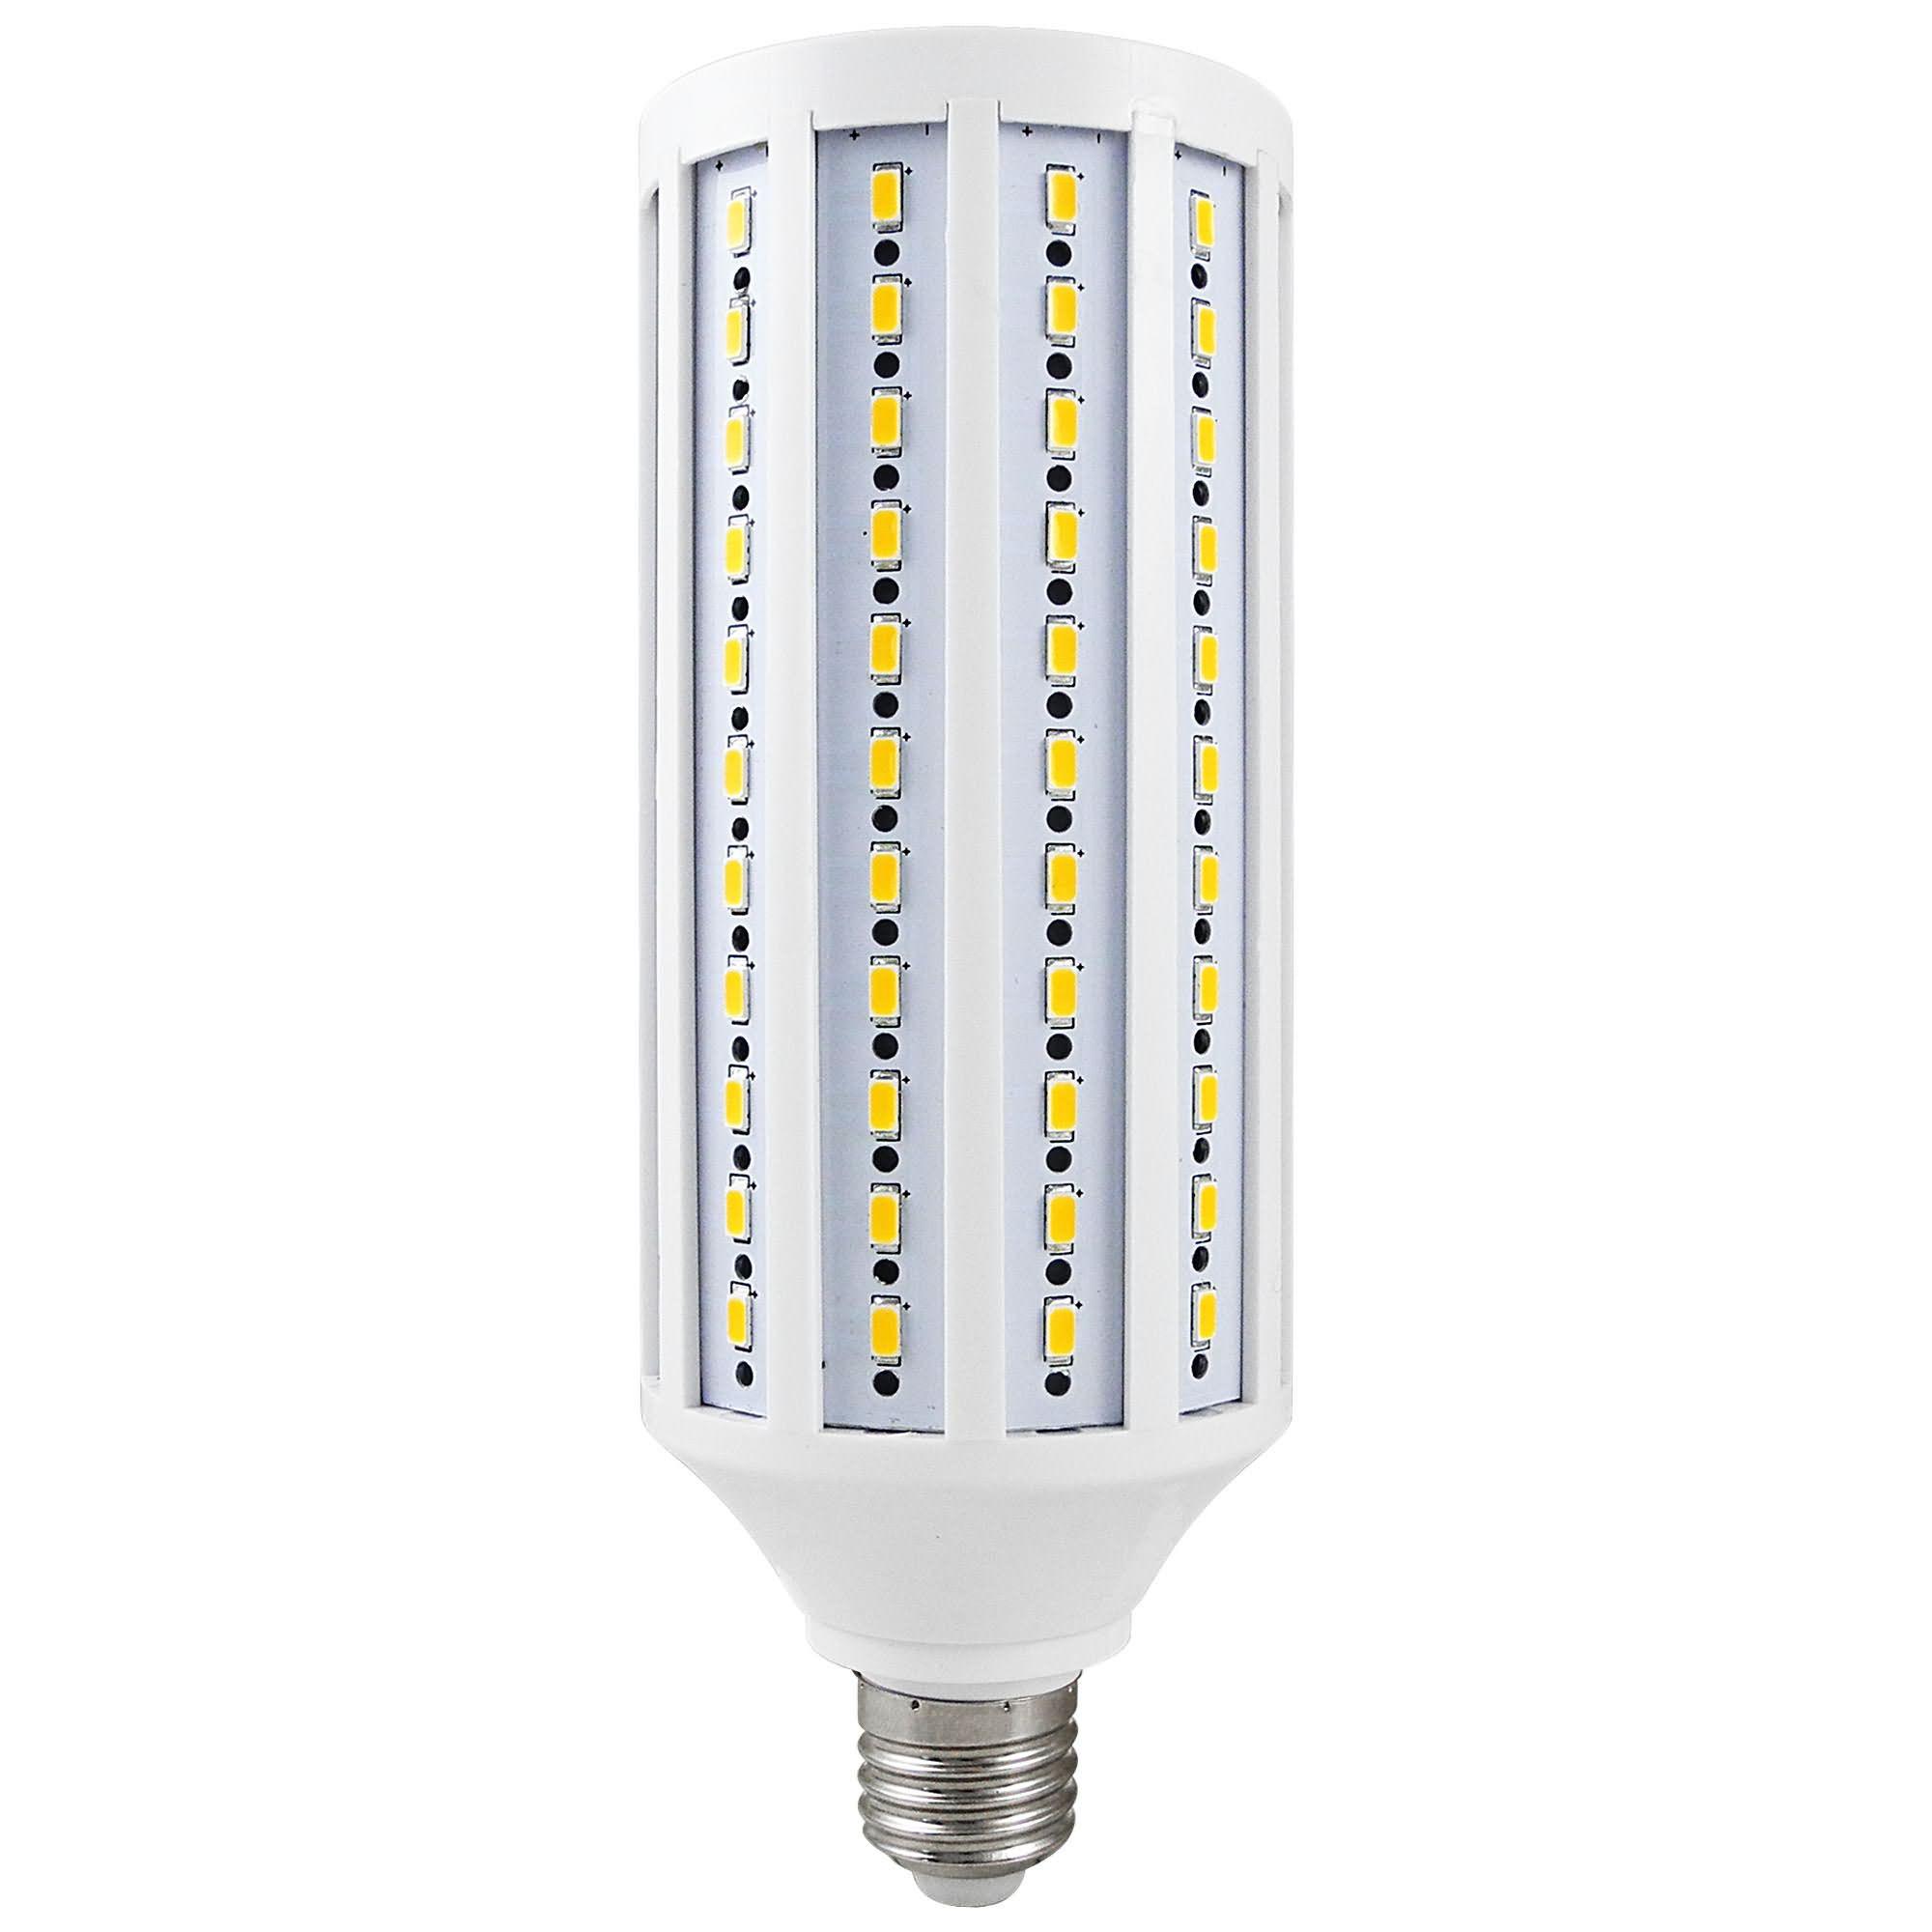 MENGS® E27 30W LED Corn Light 165x 5730 SMD LEDs LED Bulb in Warm White Energy-Saving Lamp